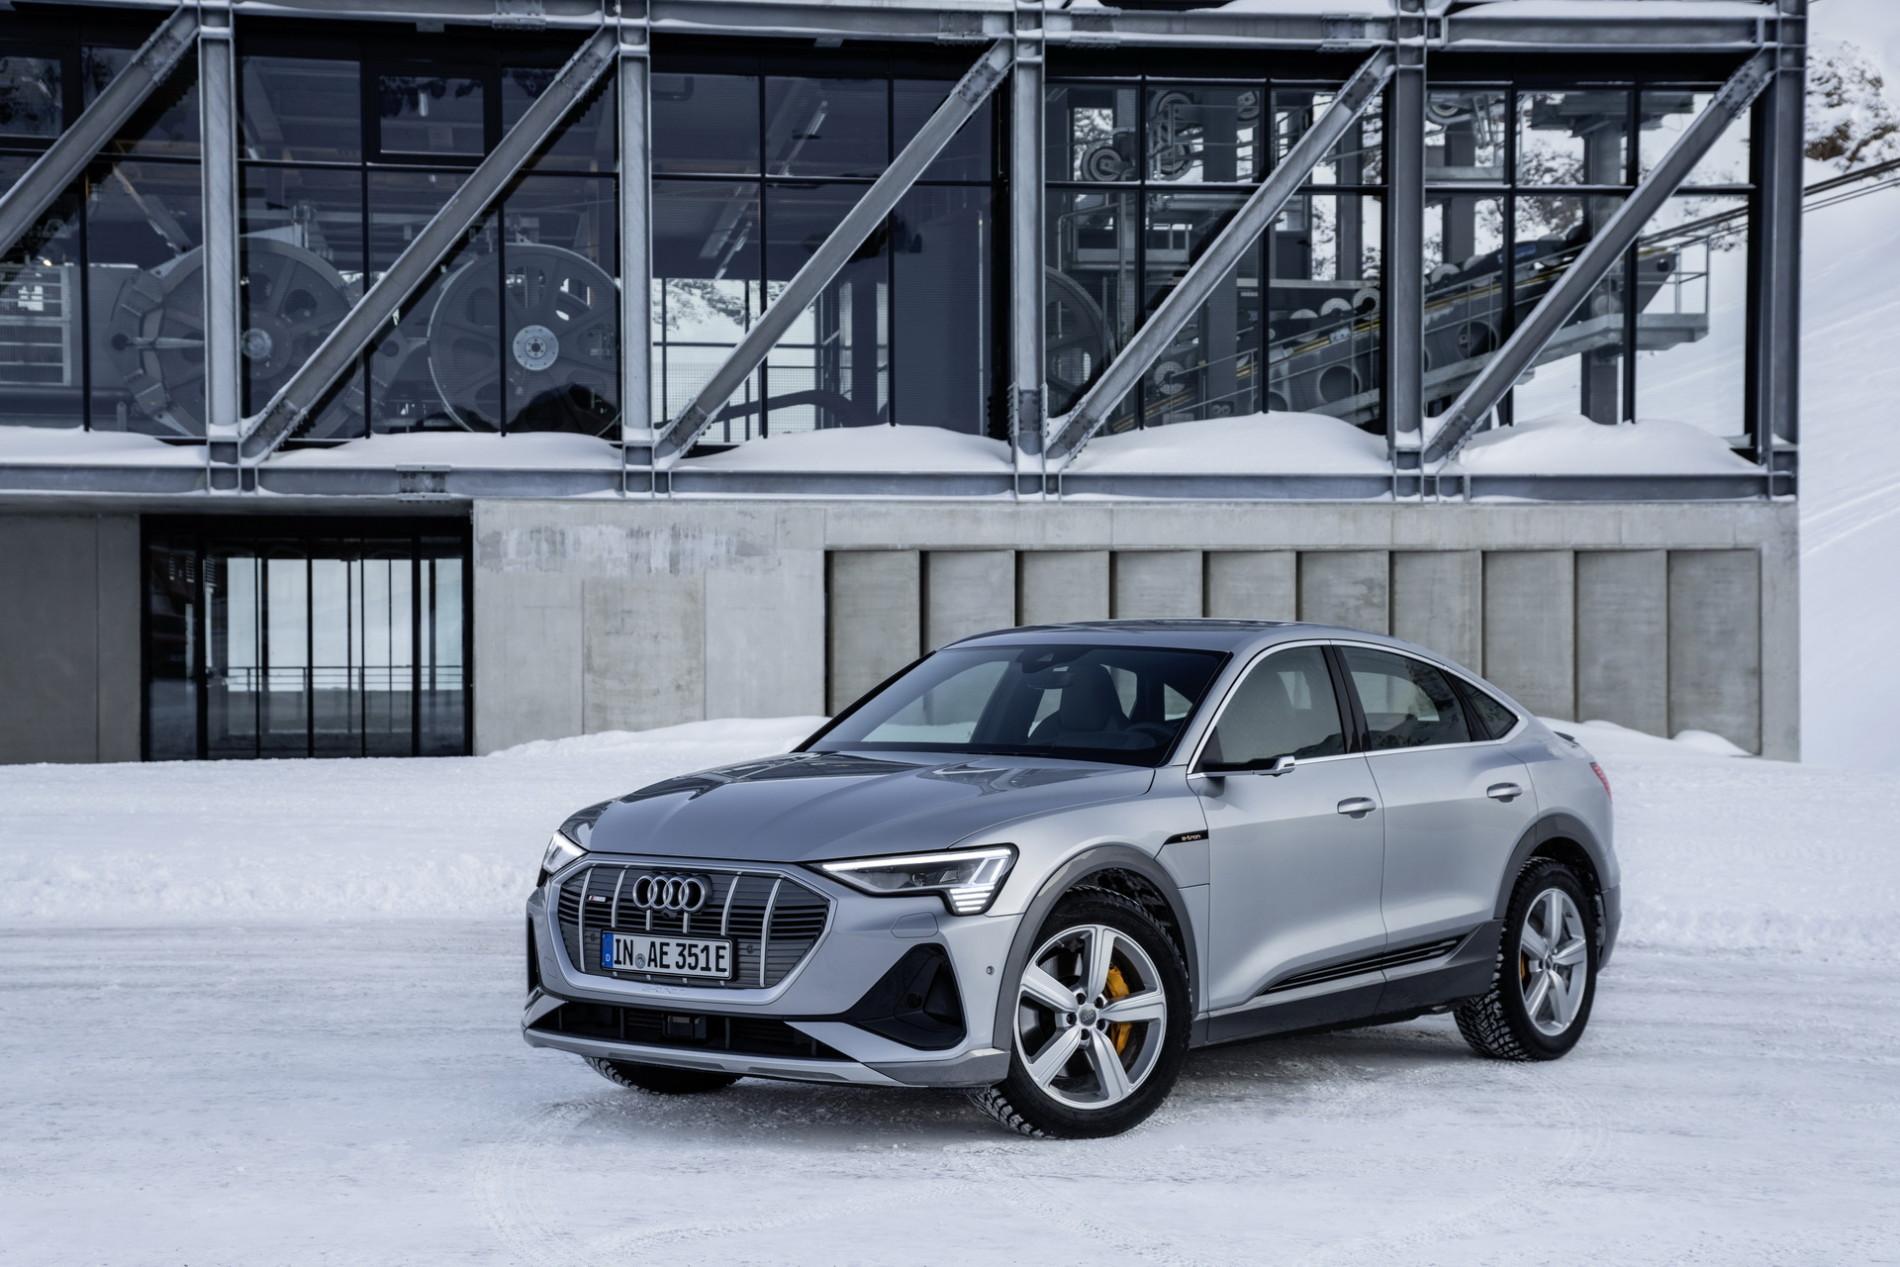 Audi E-tron Sportback - Galerie Foto - Audi E-tron Sportback - Galerie Foto